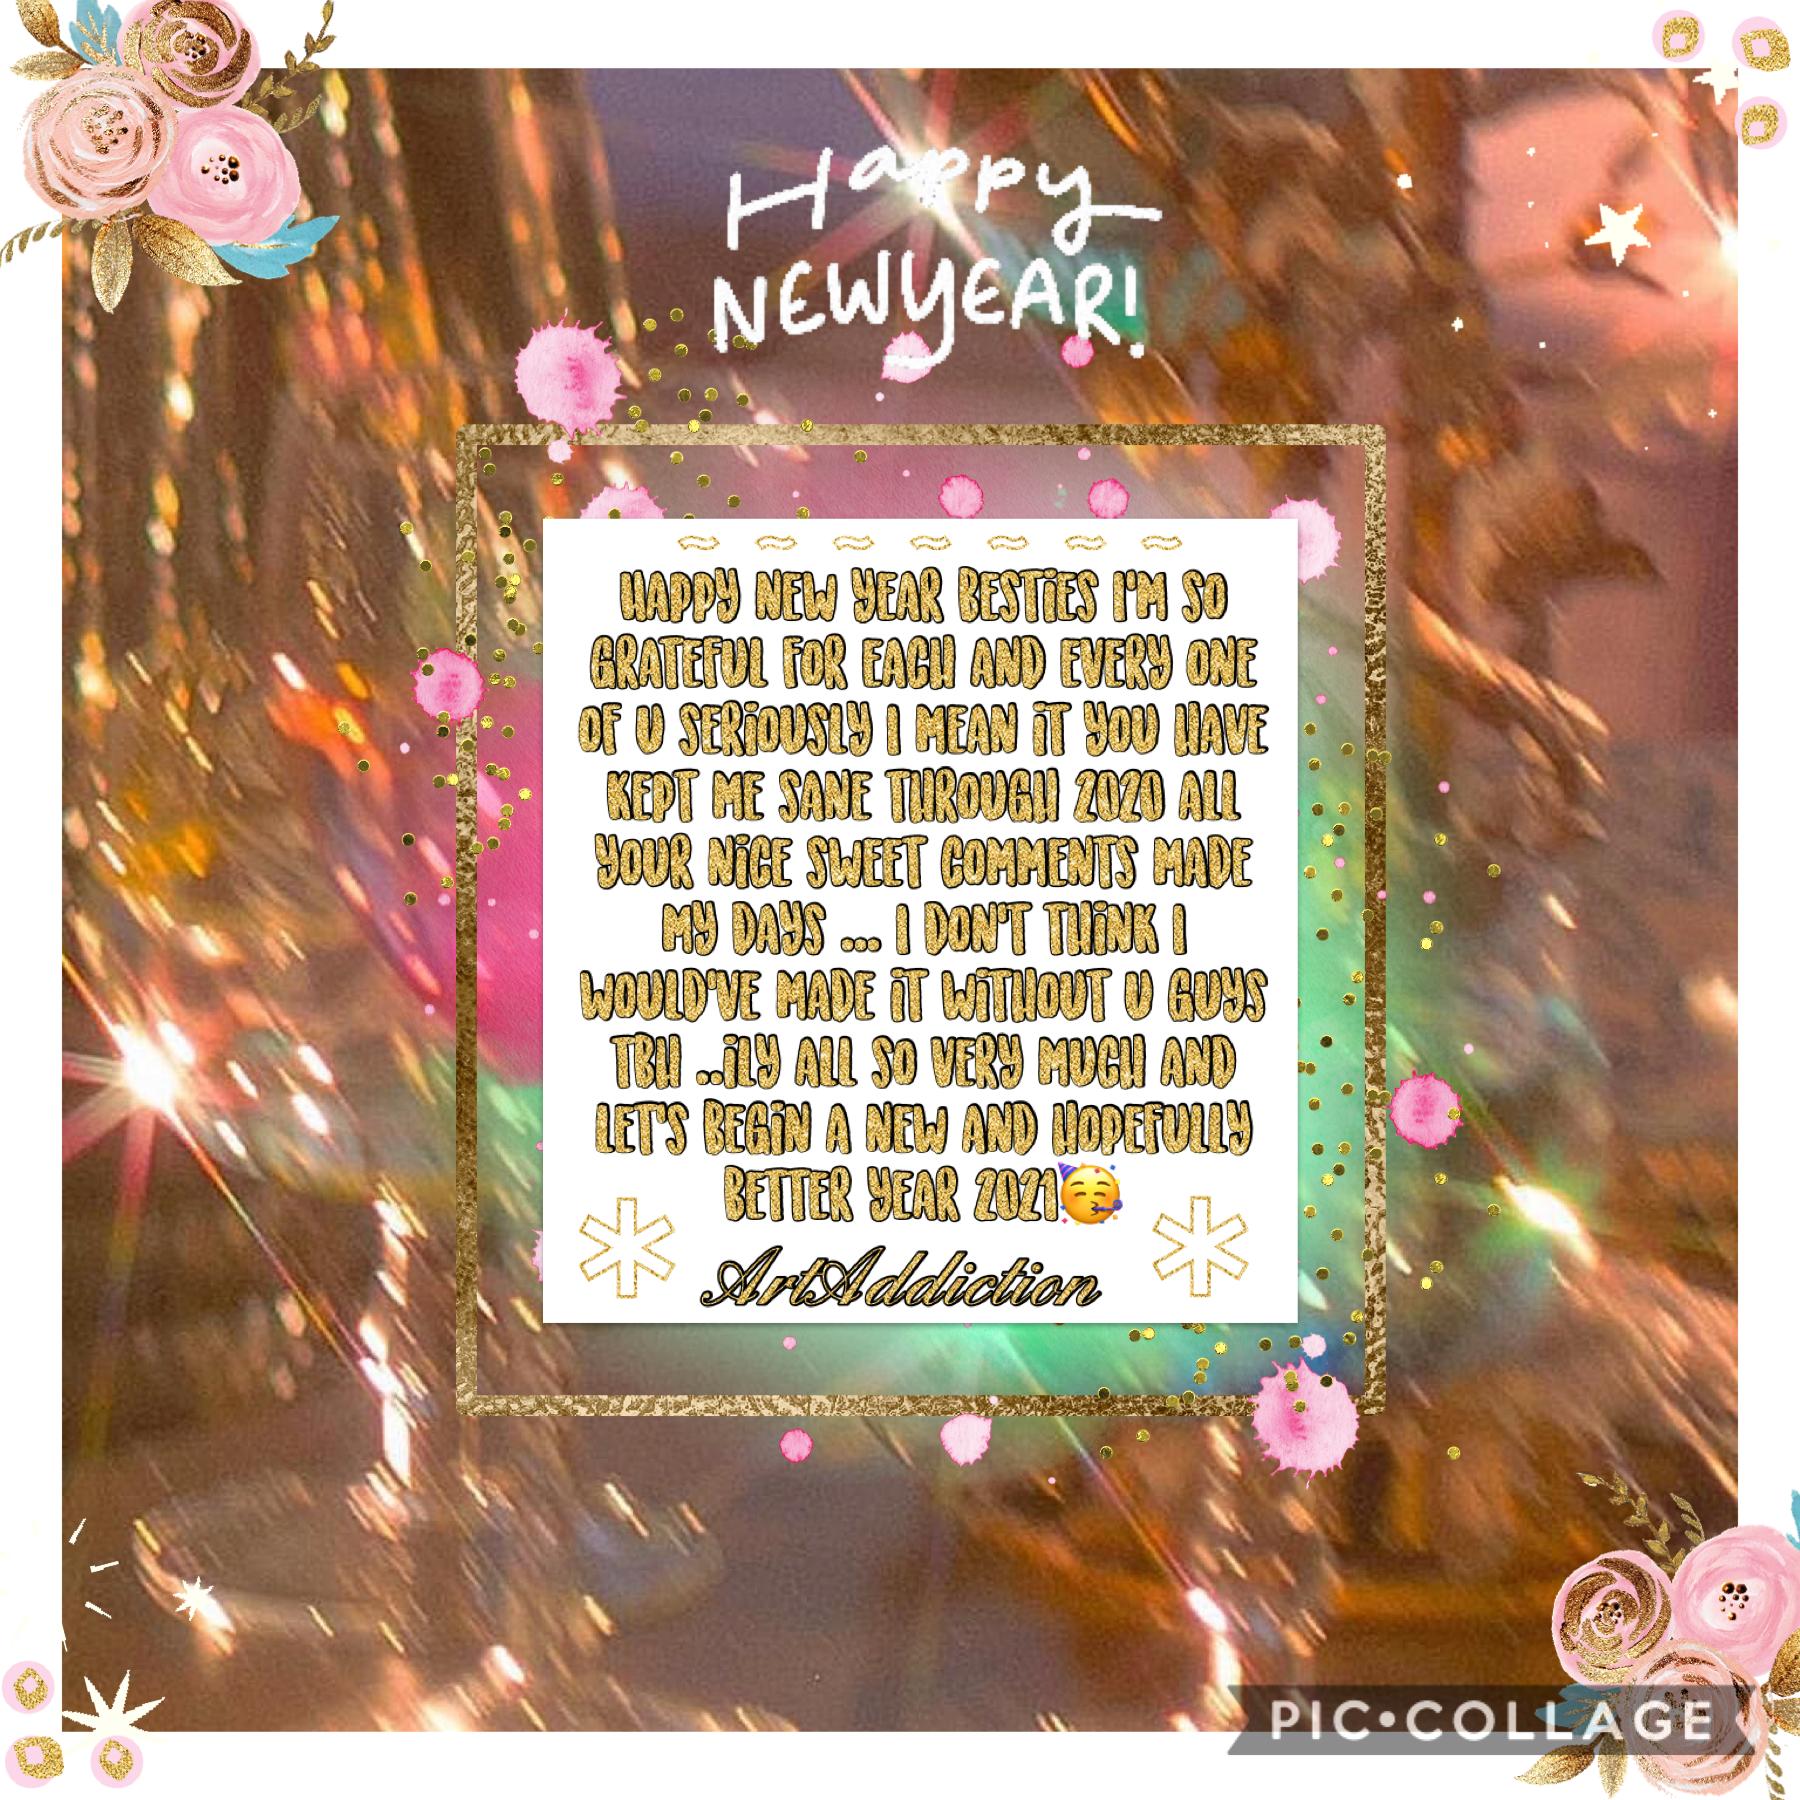 Happy New Years guys I've still got an hour left lol I'm in the uk wbu u guys ? Is it already 2021 if so happy new yearrr💕💖🥳